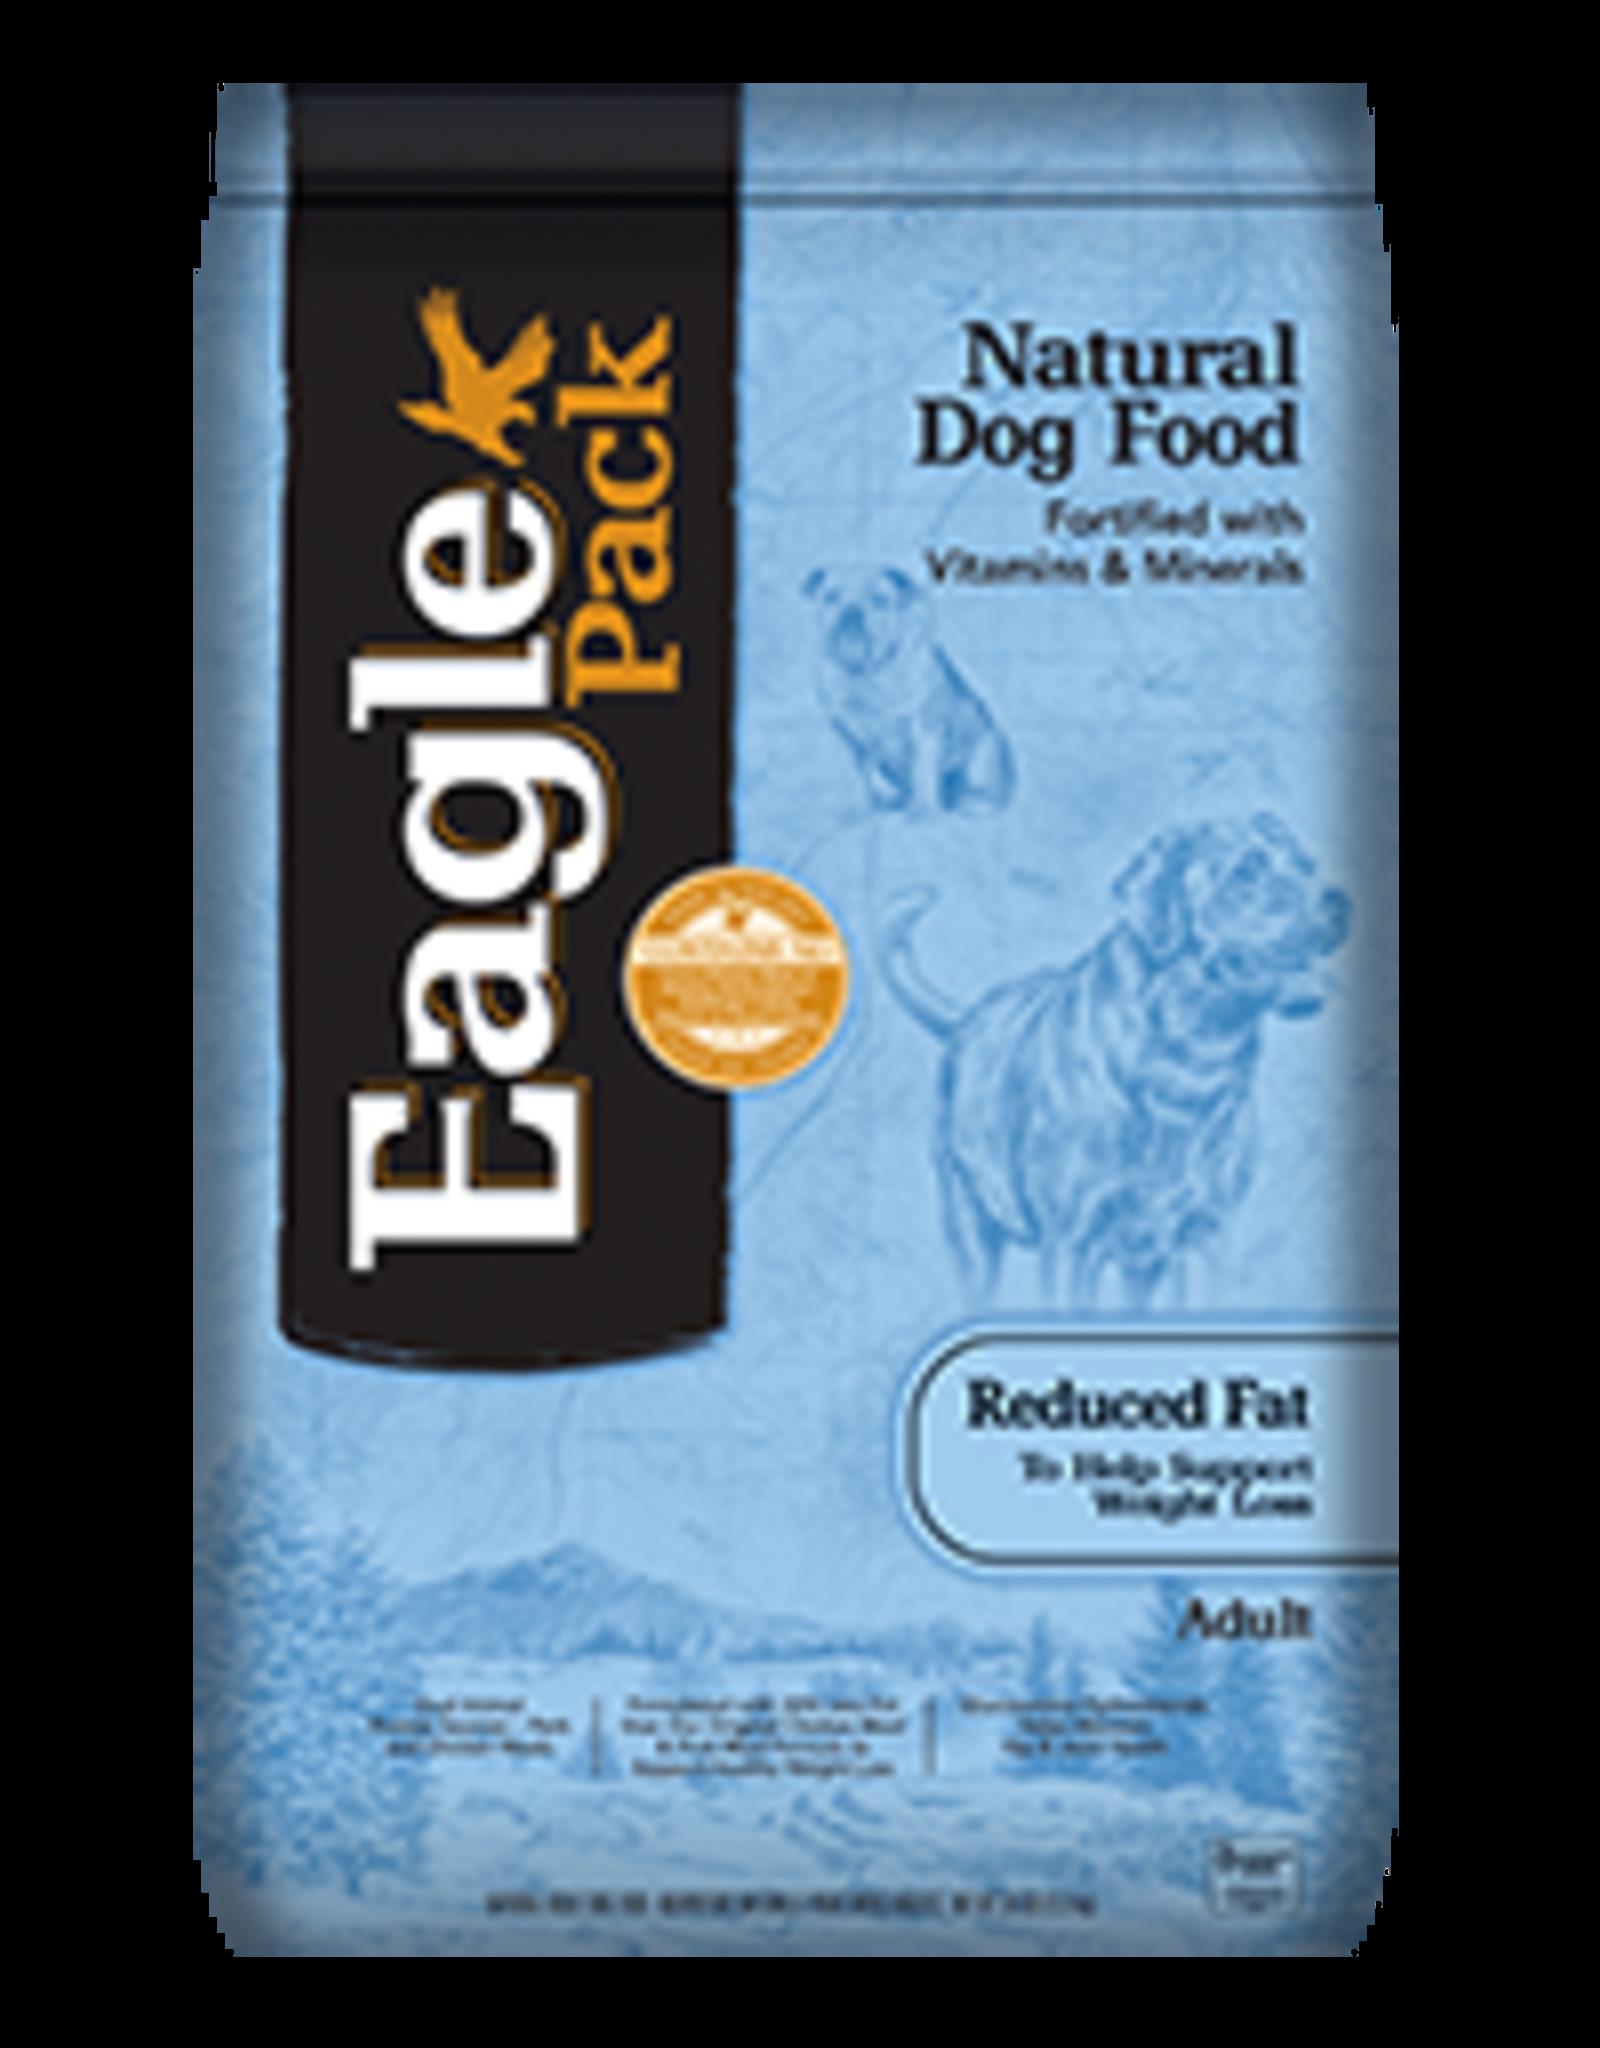 WELLPET LLC EAGLE PACK DOG REDUCED FAT 15LBS